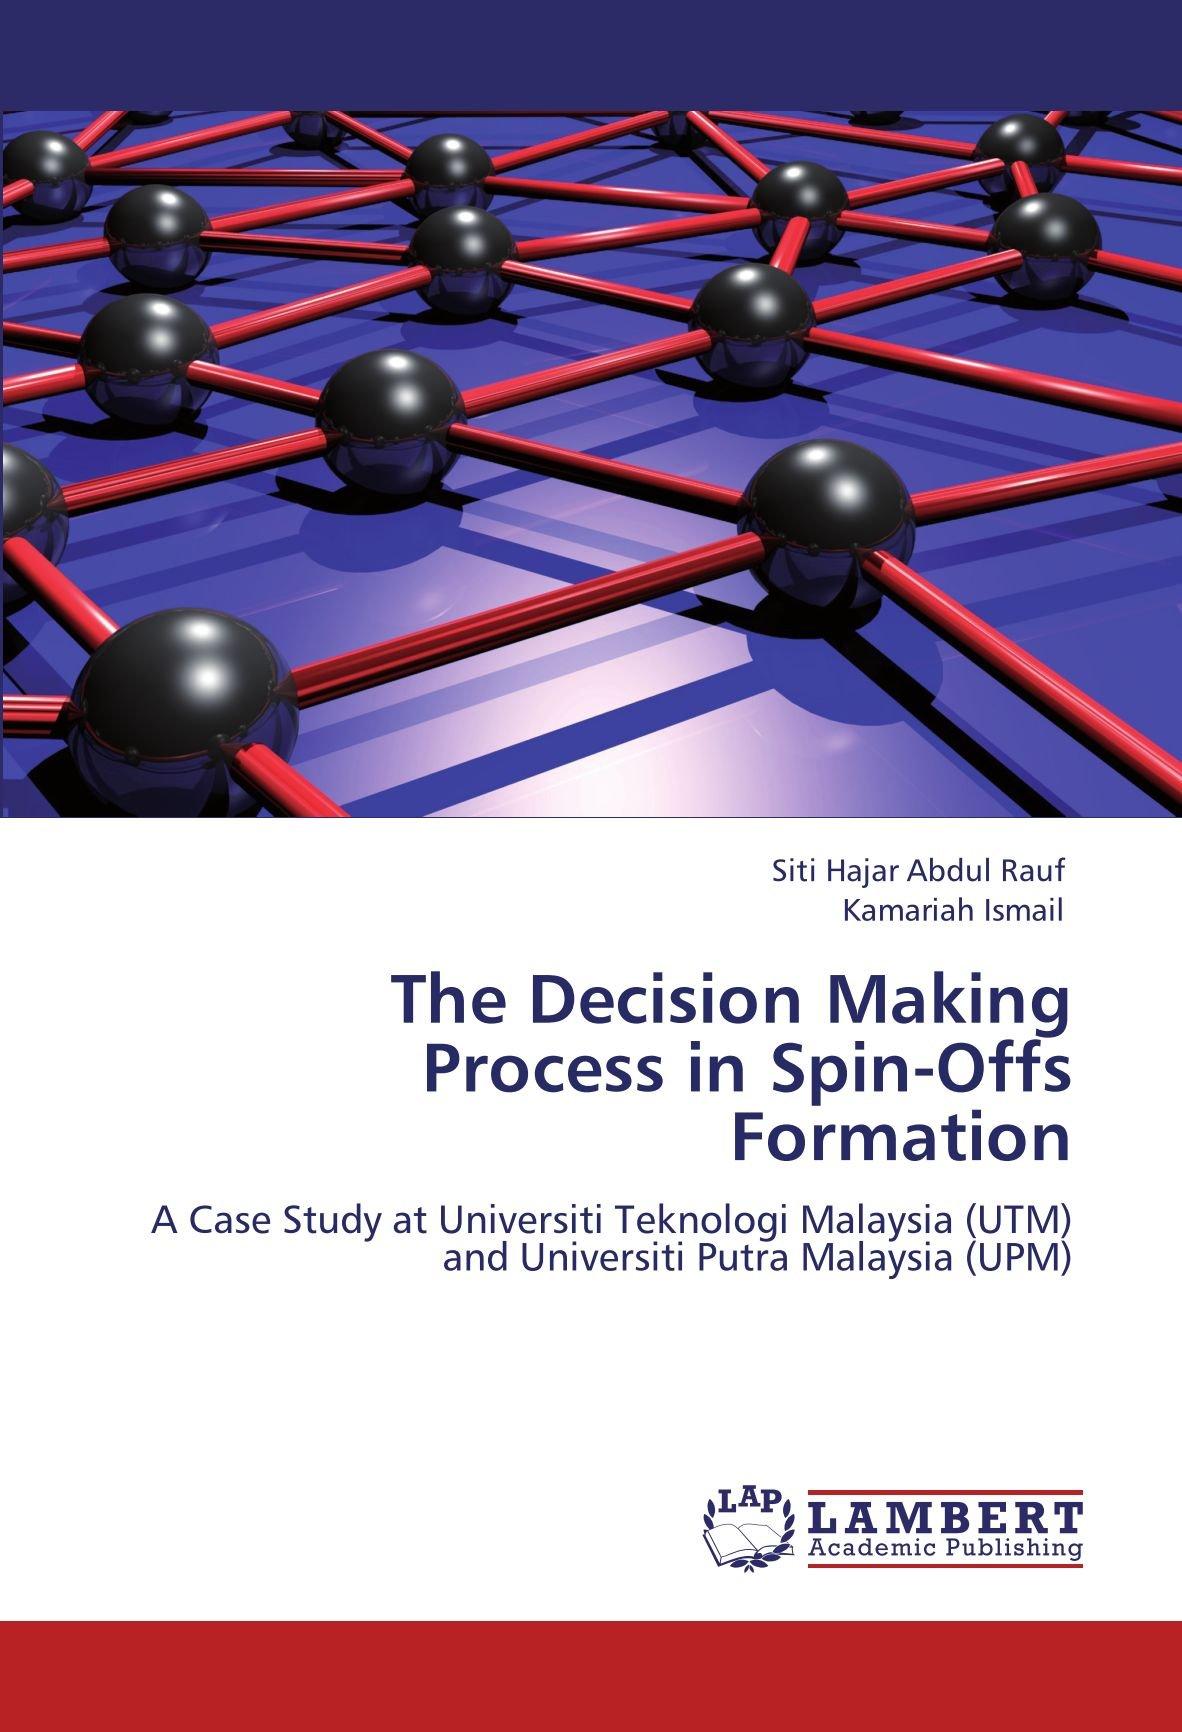 Download The Decision Making Process in Spin-Offs Formation: A Case Study at Universiti Teknologi Malaysia (UTM) and Universiti Putra Malaysia (UPM) PDF